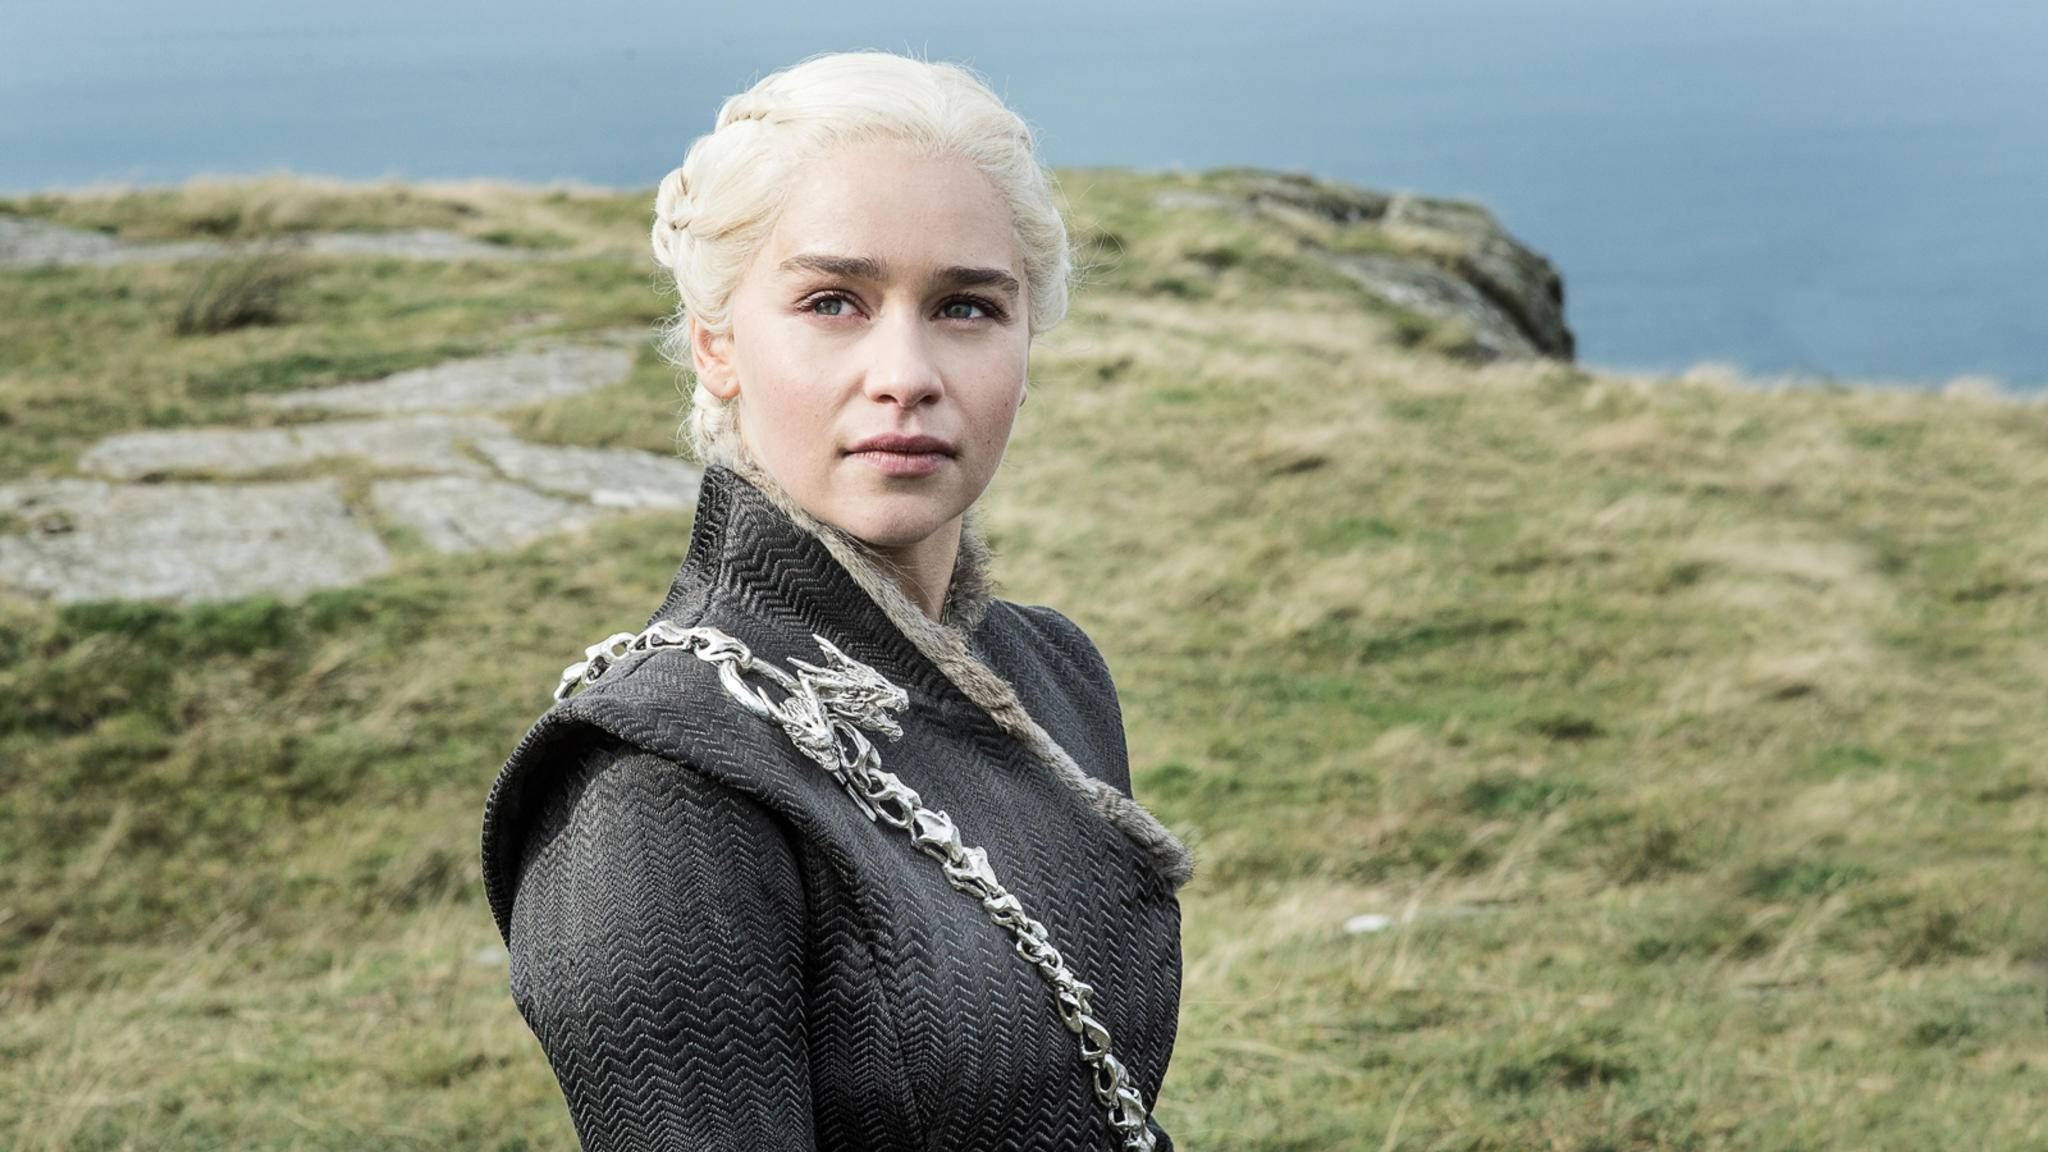 Für Daenerys Targaryen heißt es nun endgültig: Bye-bye Westeros!